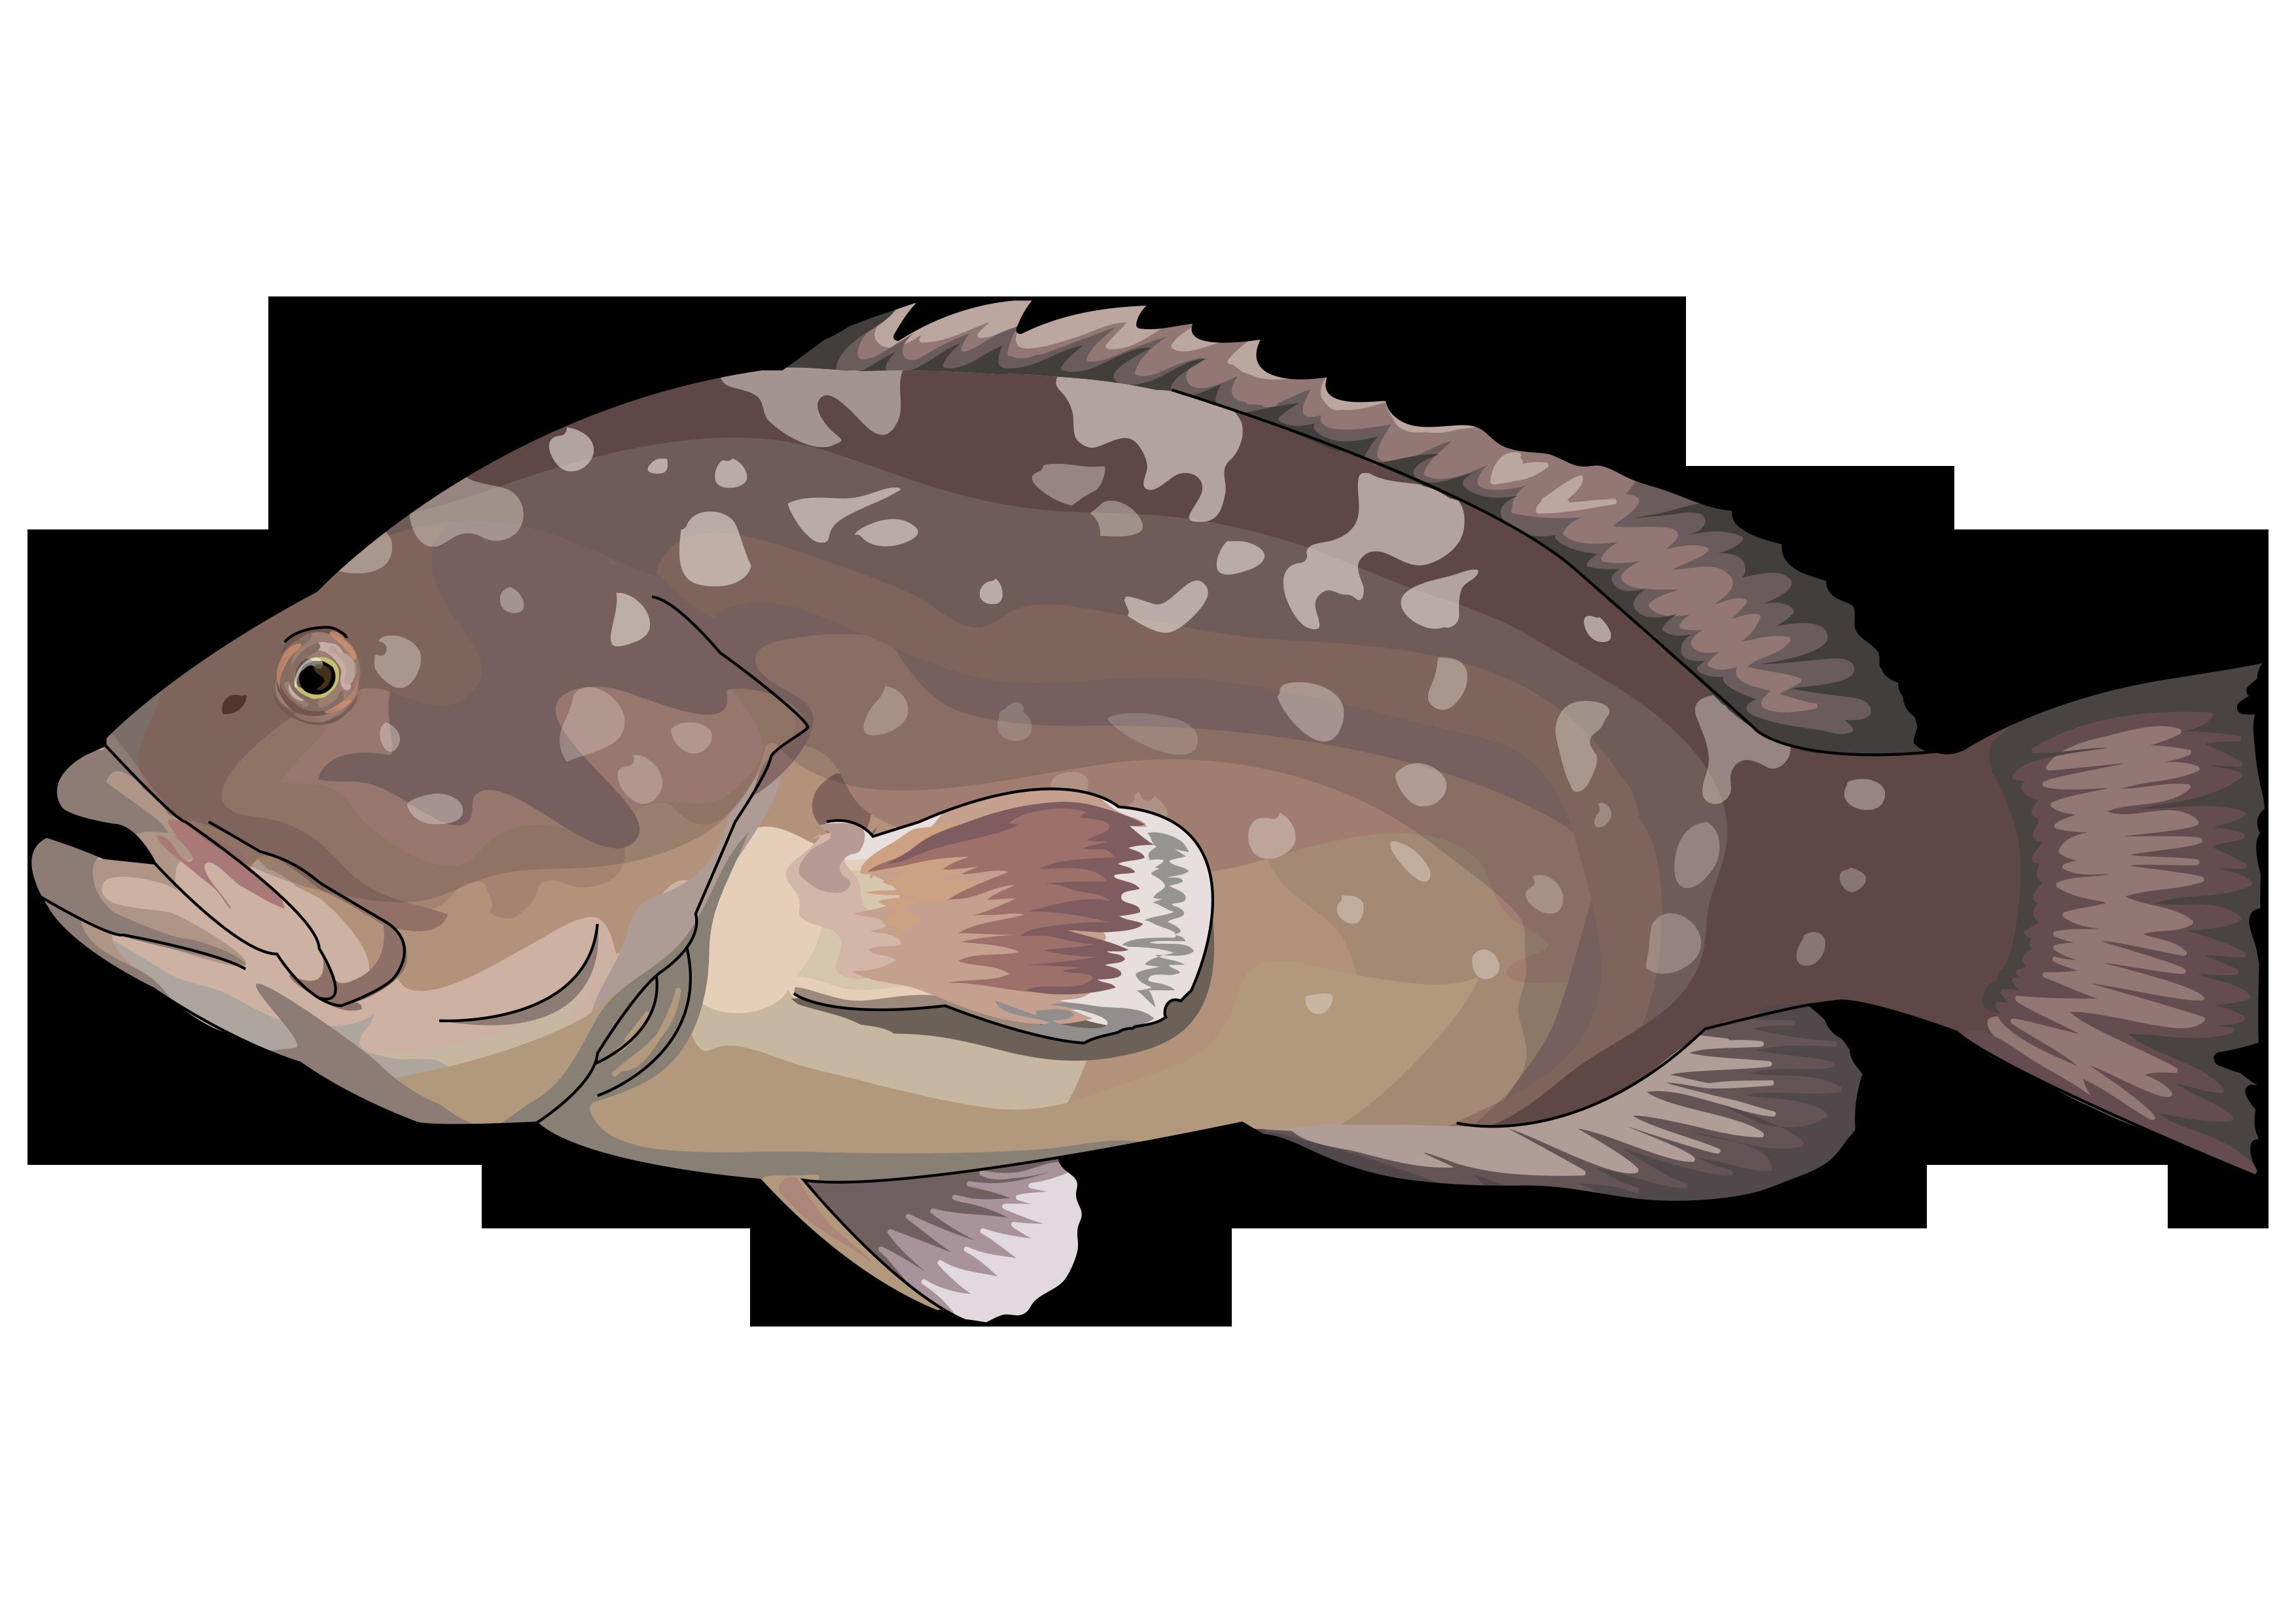 Lámina: Fauna marina, peces de fondo 1 » Recursos educativos digitales